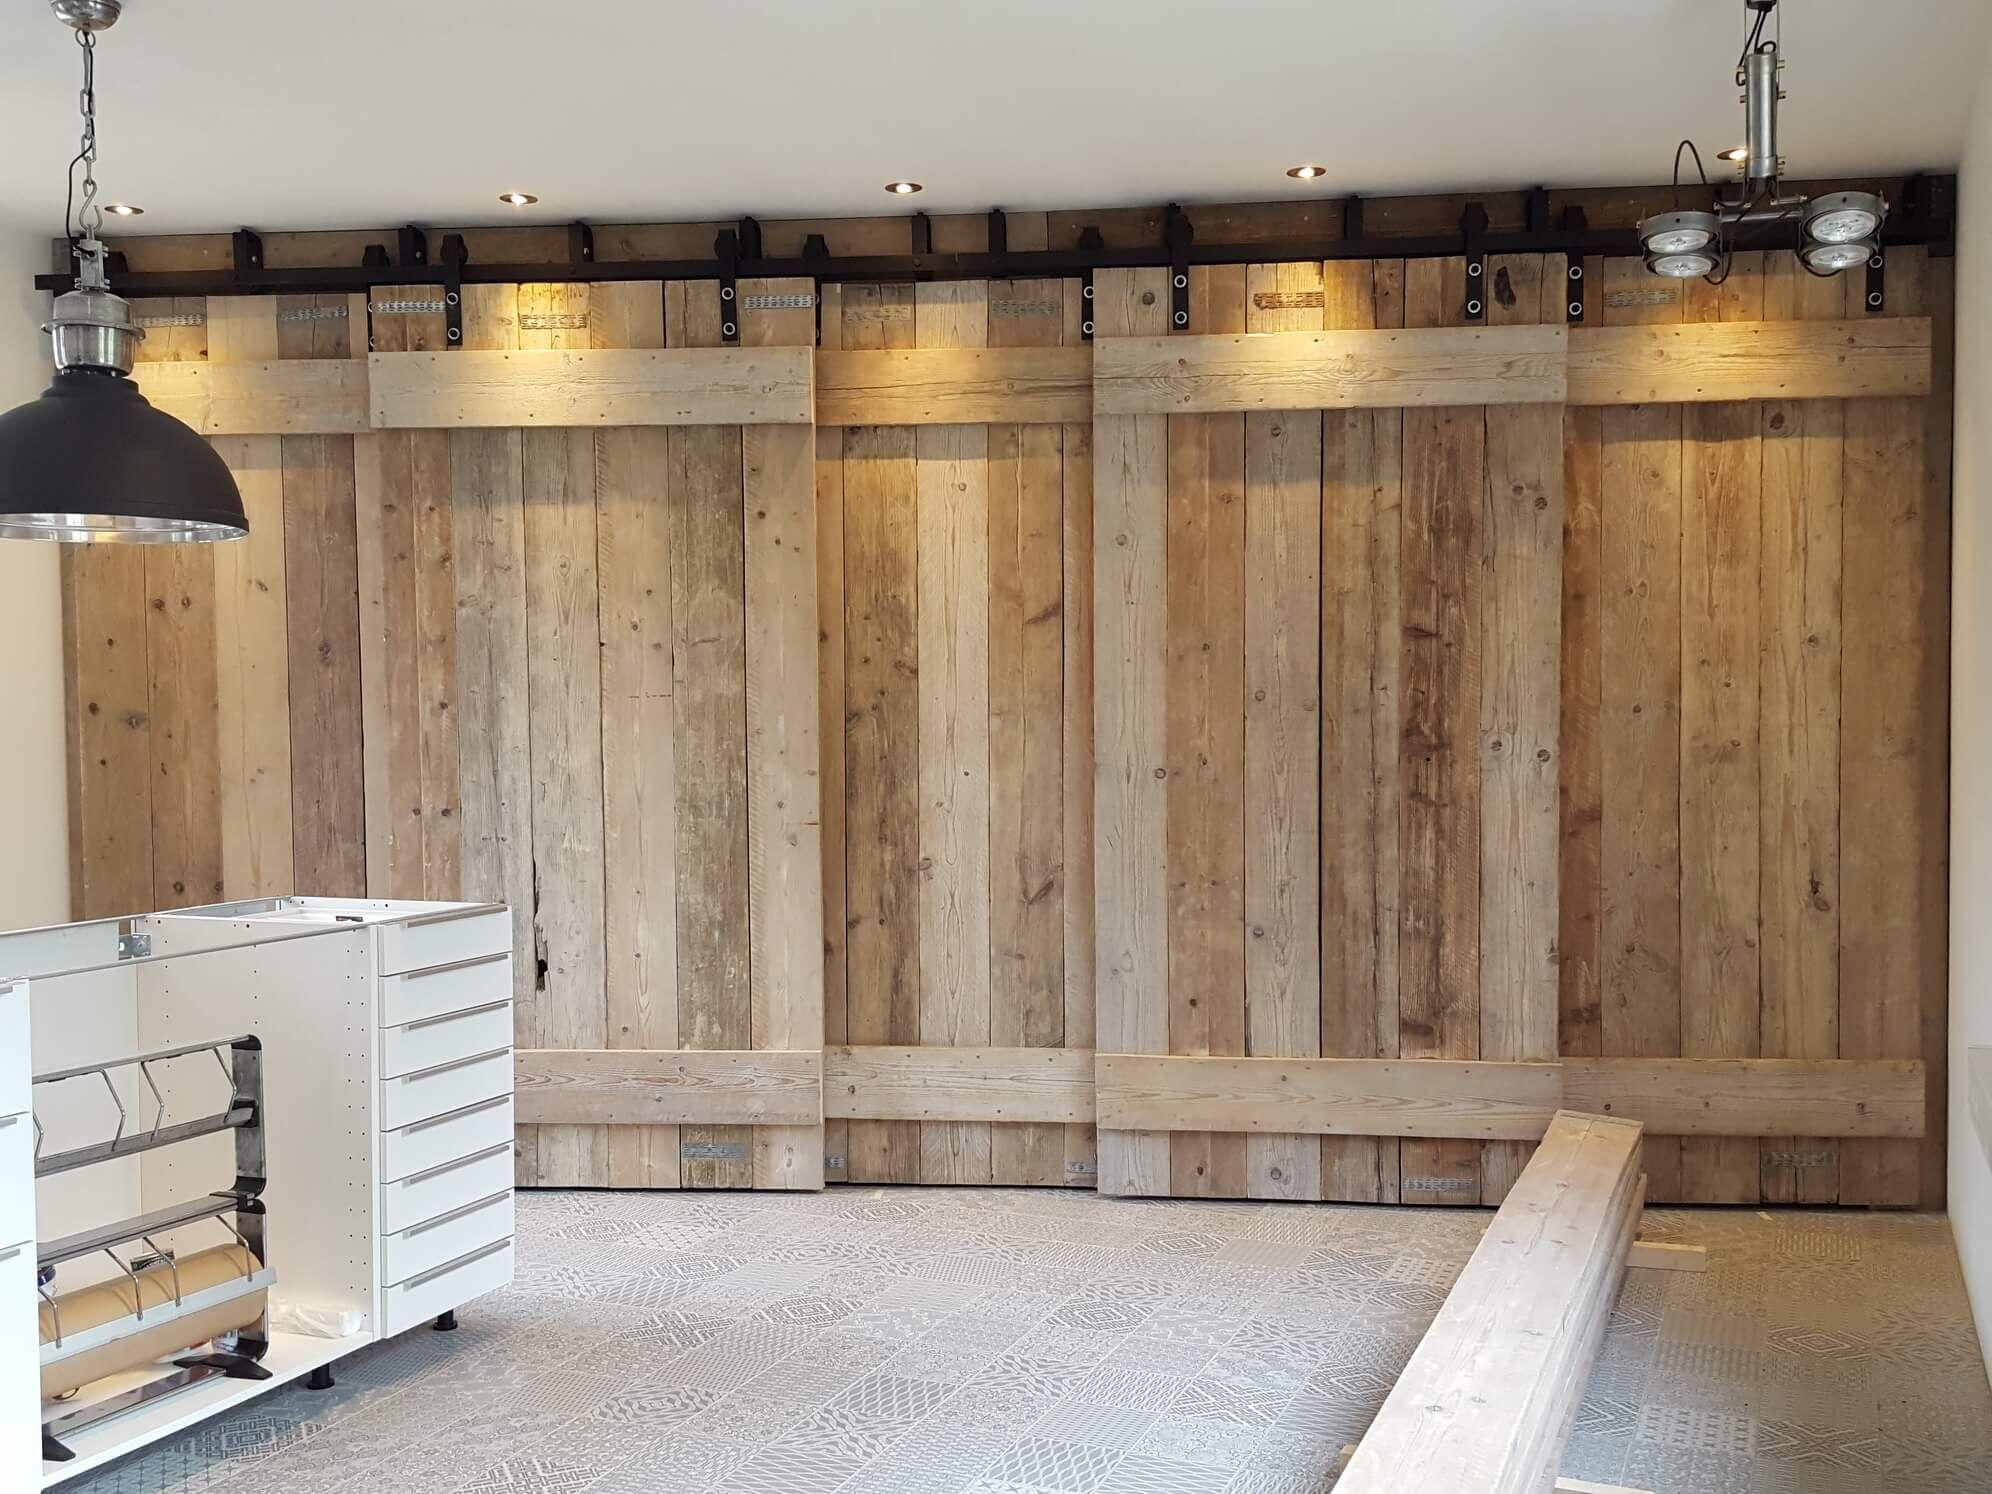 Kastenwand in 2019  Casa 54  Schuifdeur kast Slaapkamer